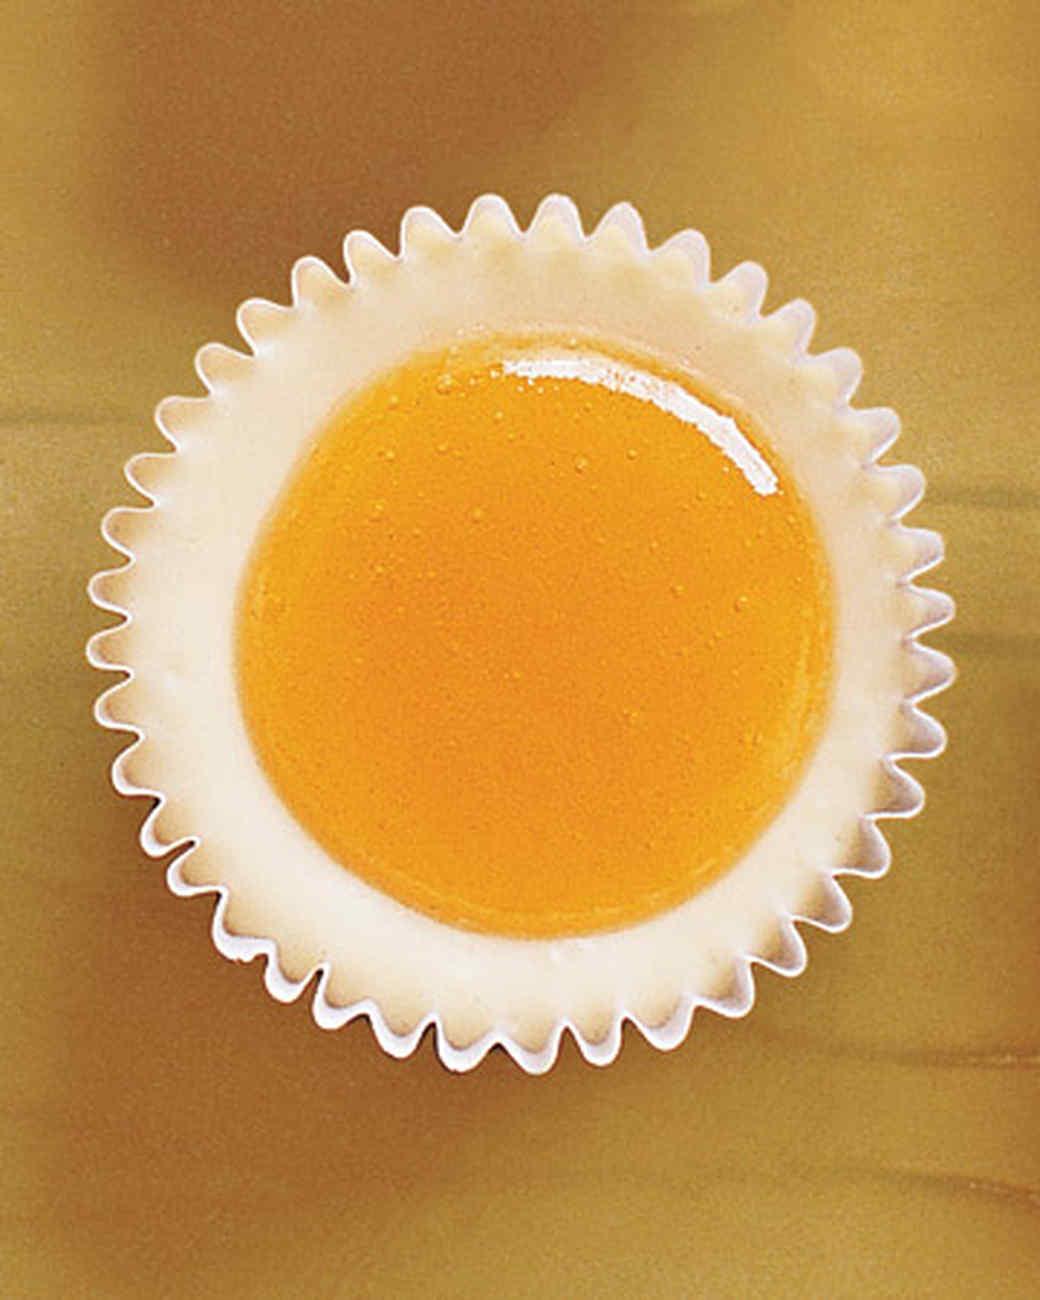 mla104524_0209_apricot.jpg